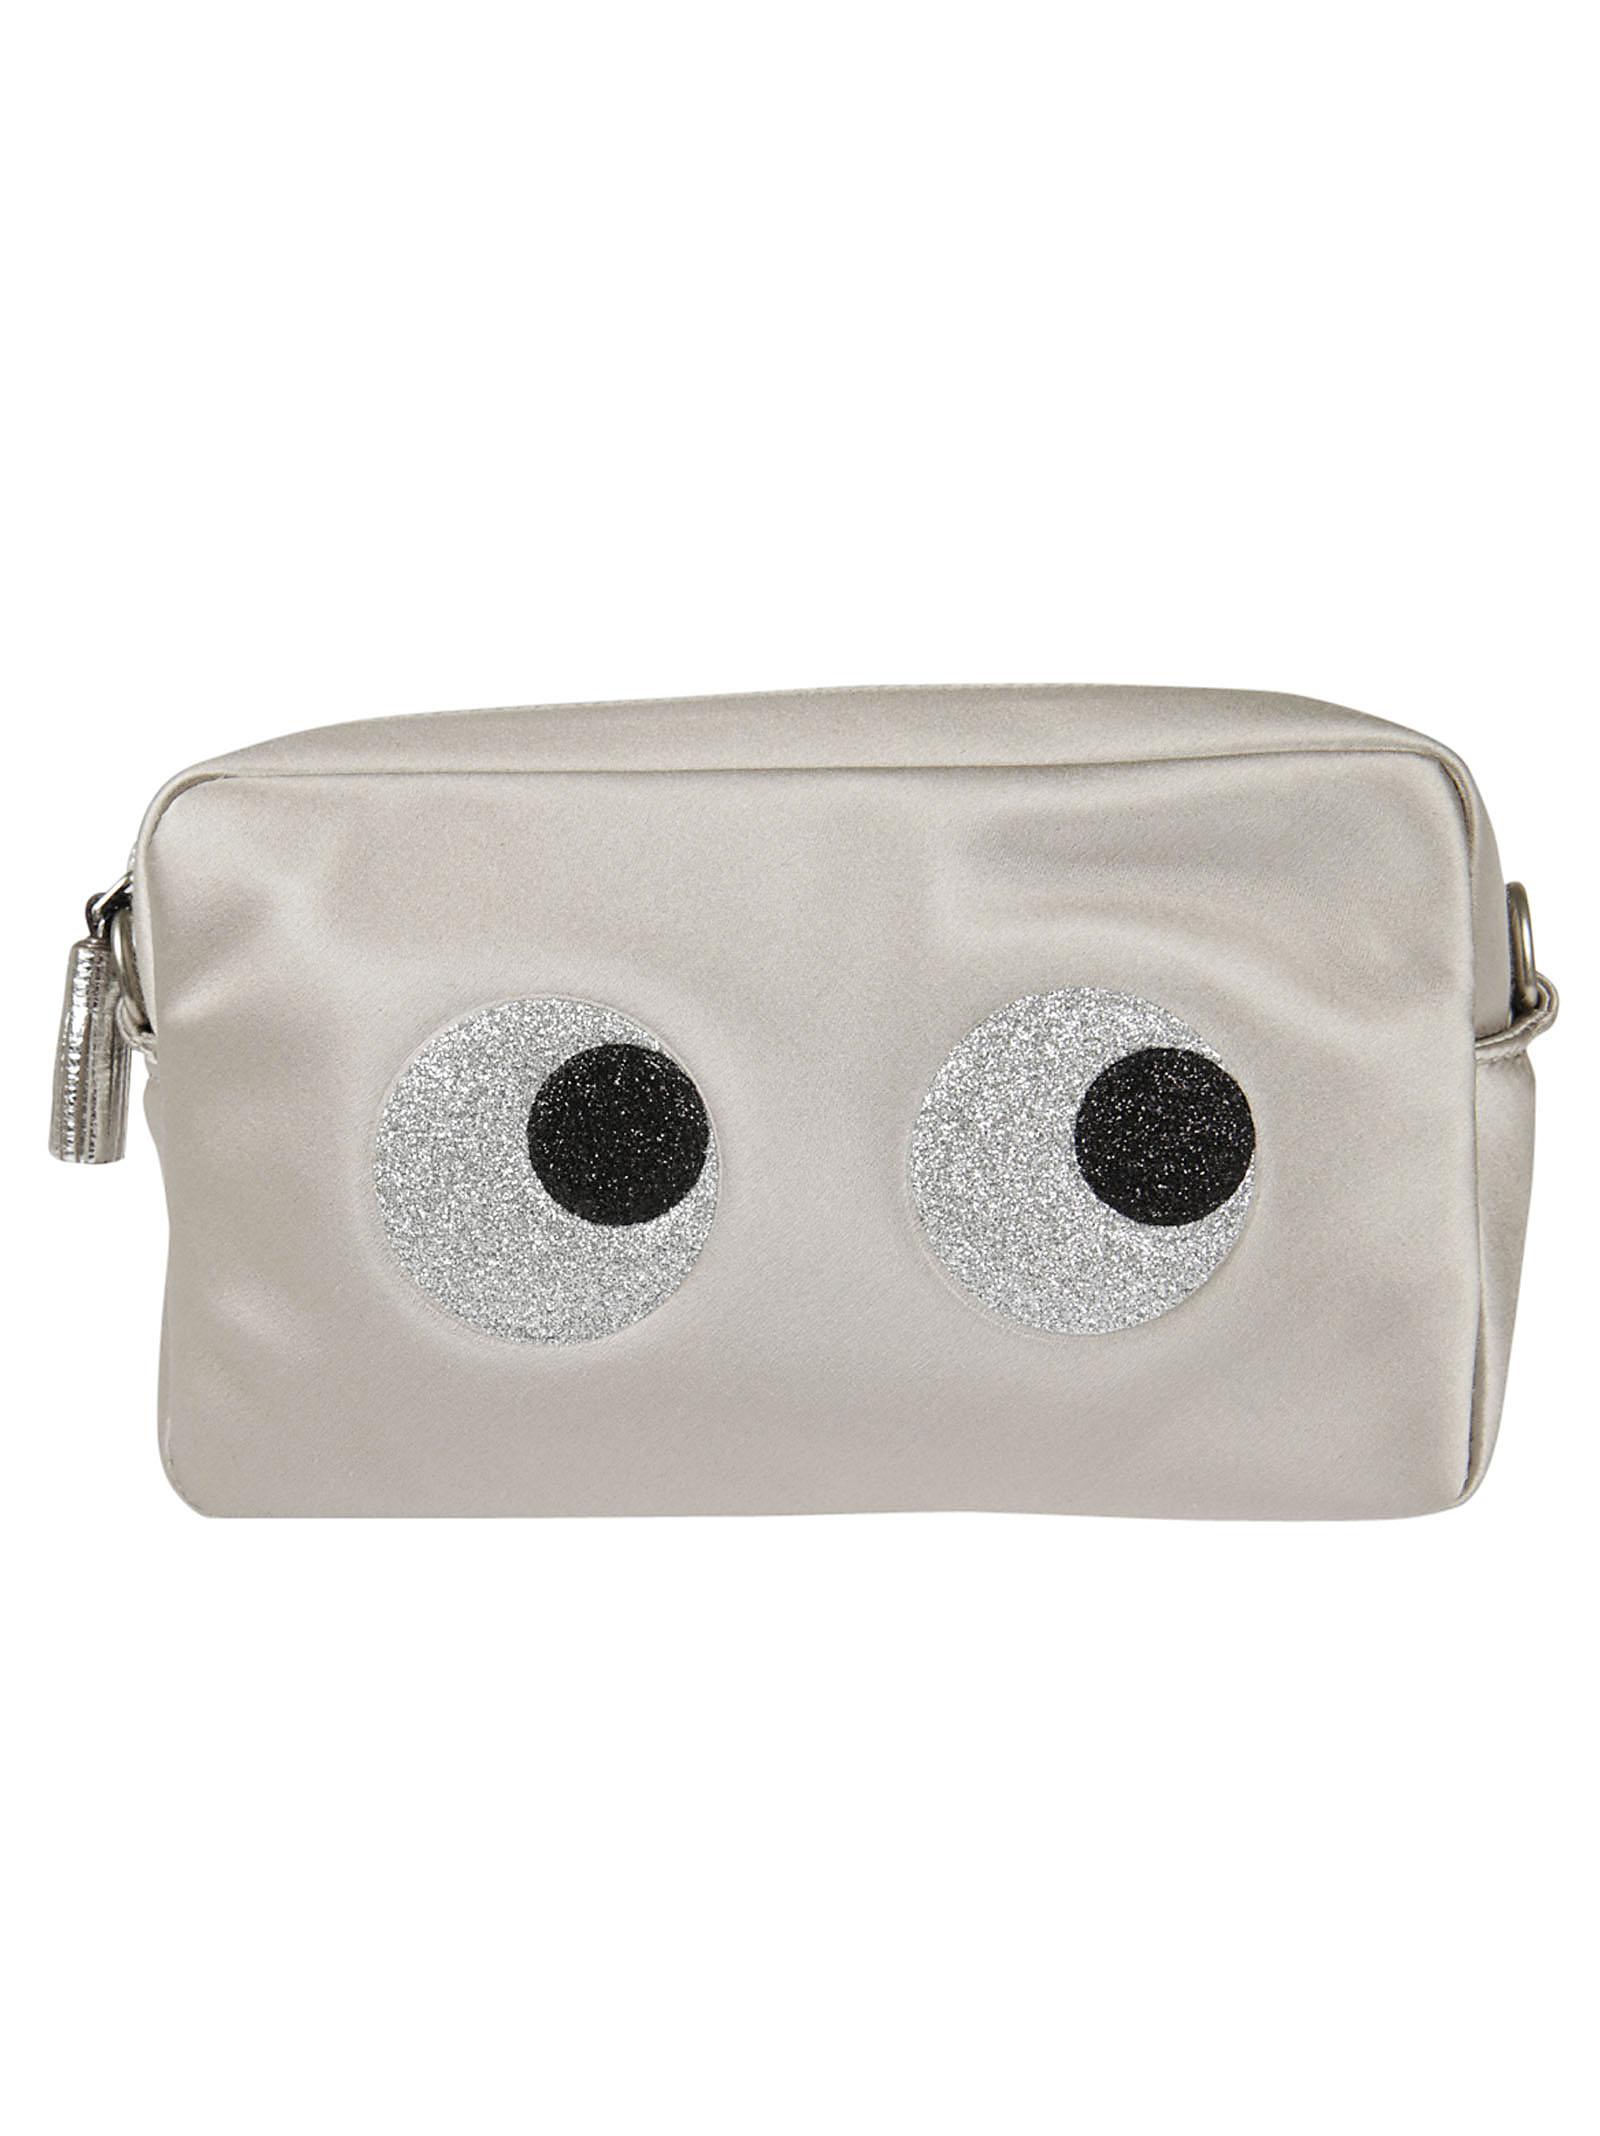 Anya Hindmach chain clutch glitter eyes in satin